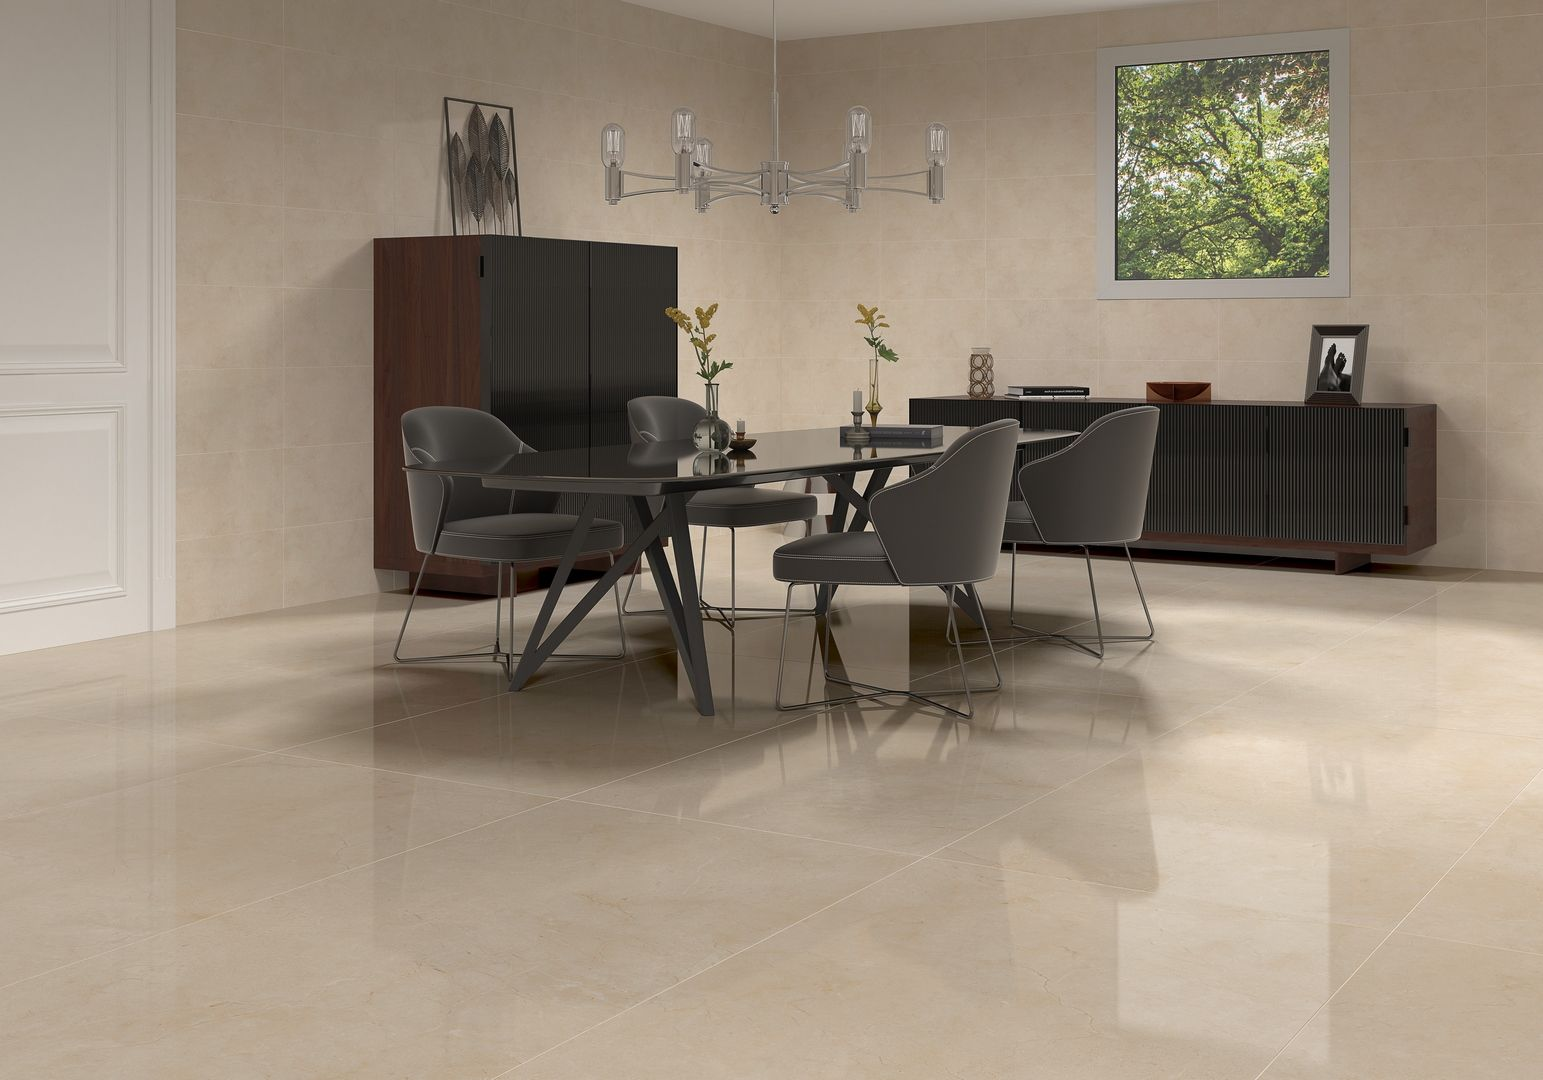 Carrelage Imitation Parquet 30X60 carrelage effet marbre 30x60 beige brillant vision | salle